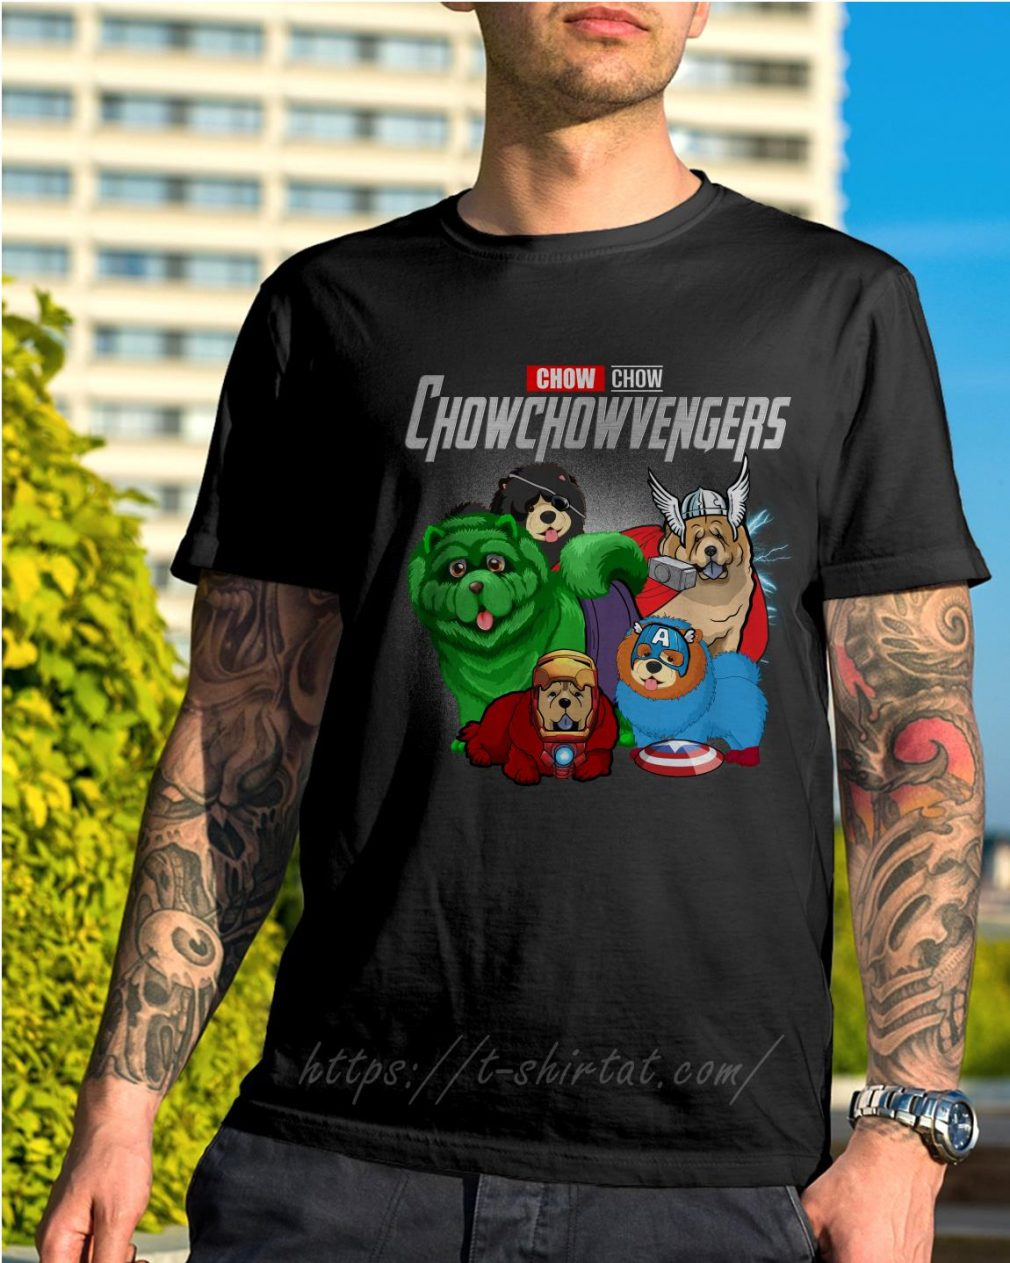 Marvel Chow Chow Chowchowvengers shirt